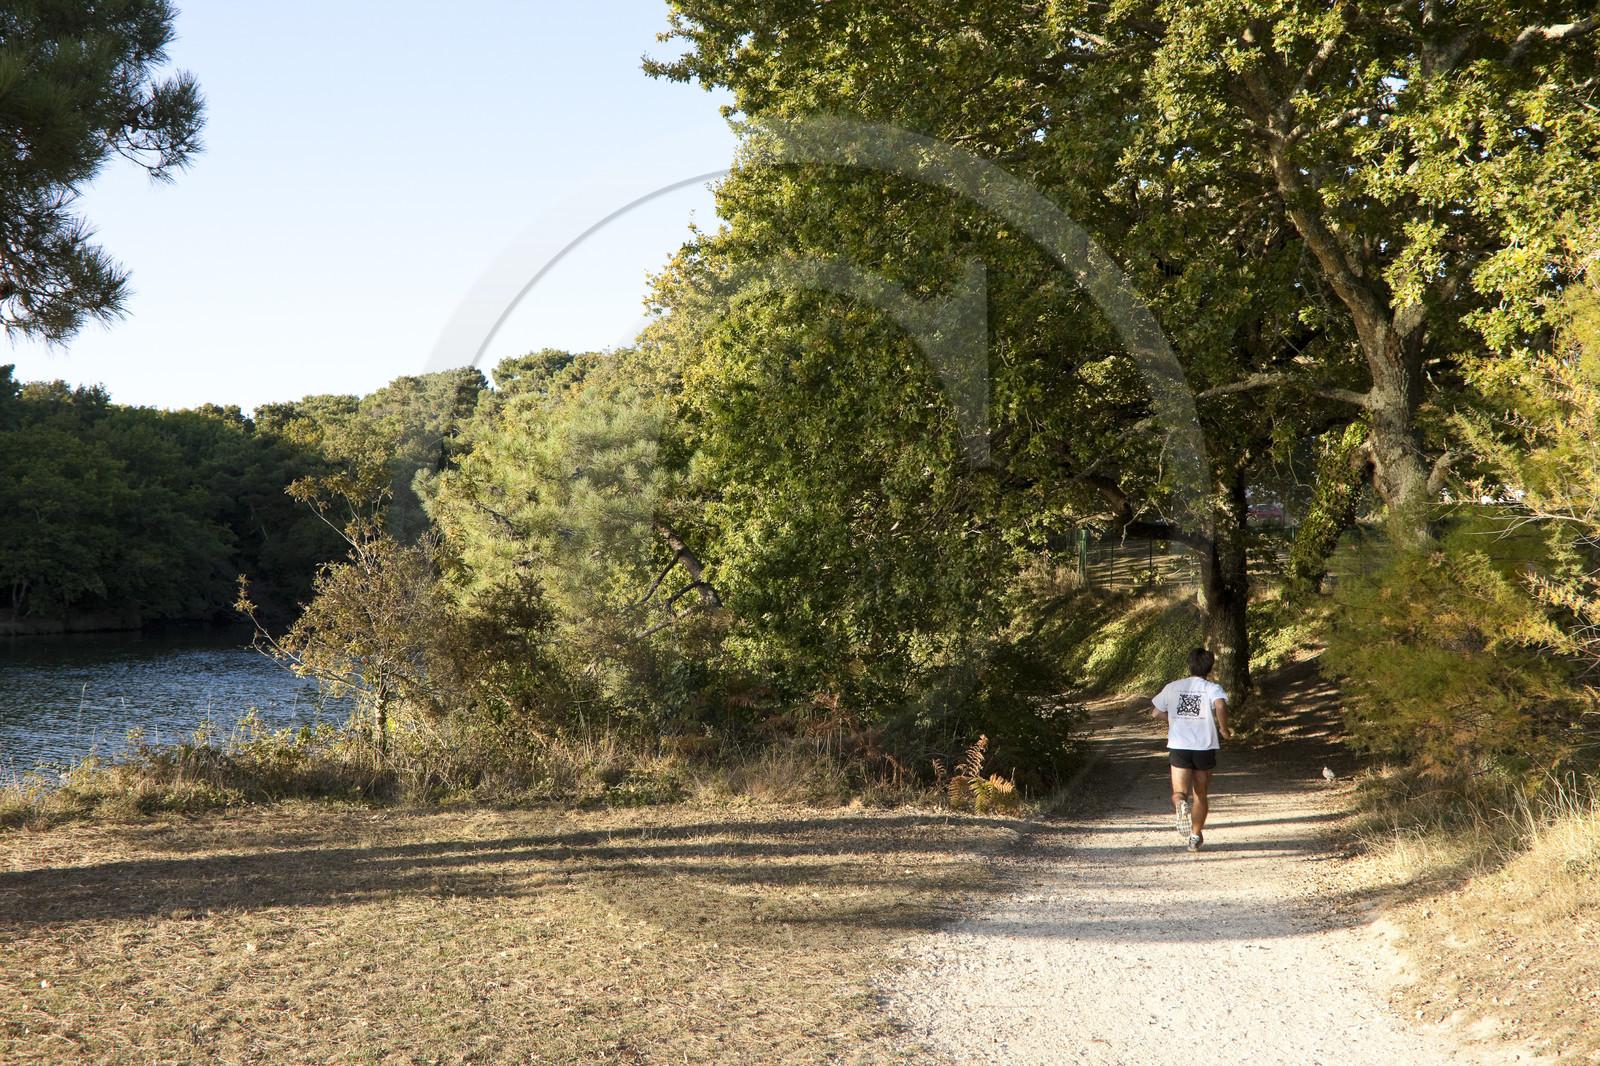 Running autour de l 39 tang du ter onvasortir lorient for Terrace jogging track